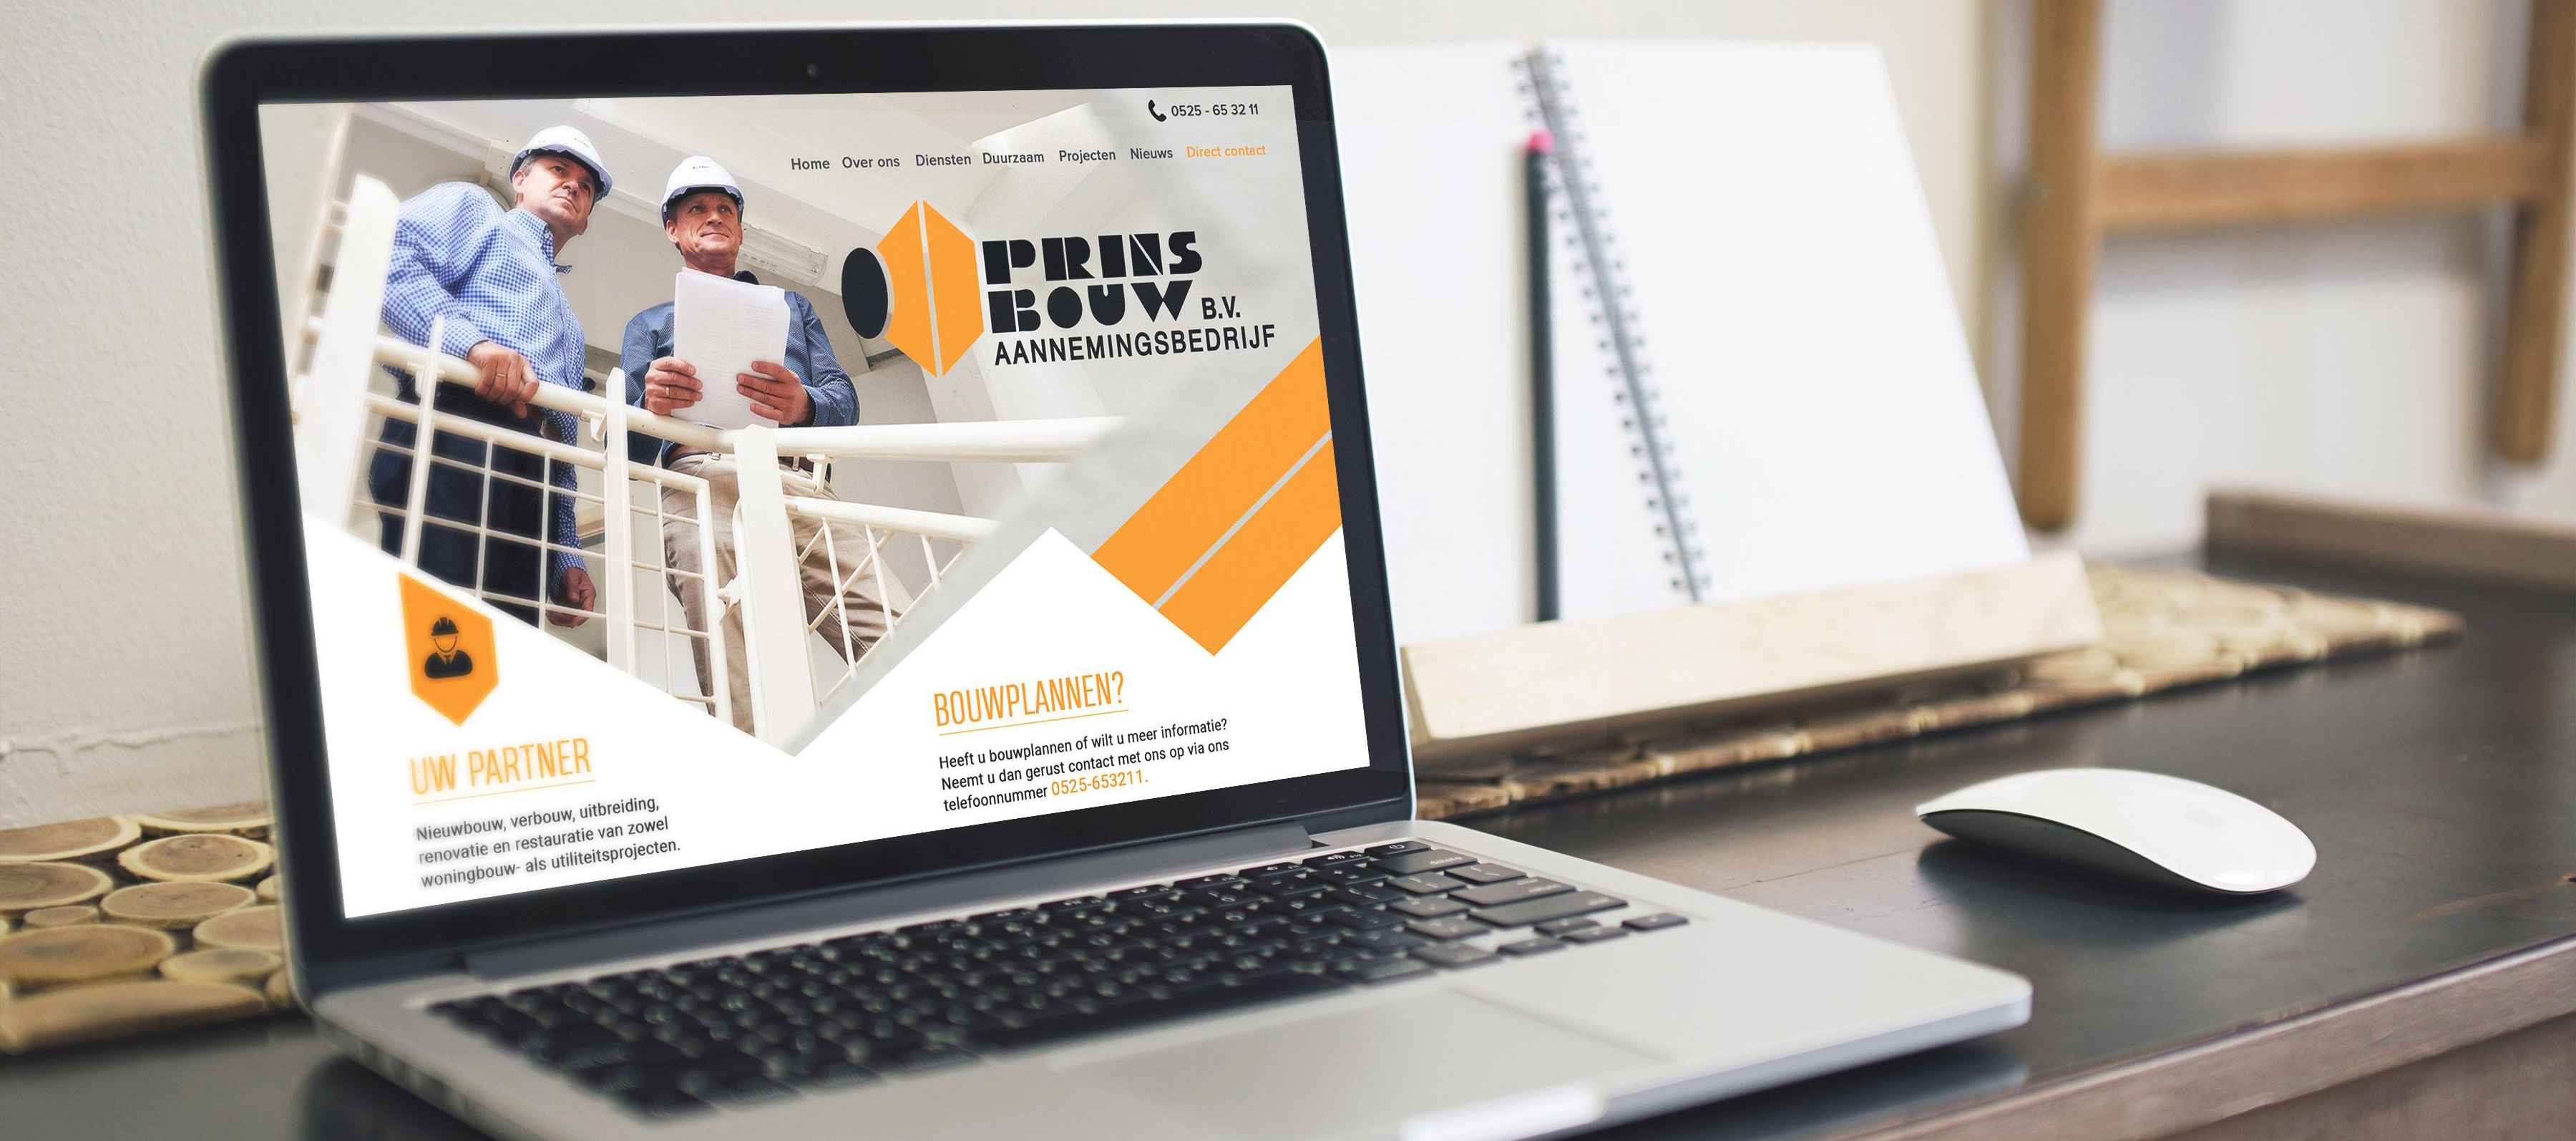 Prins-Bouw-webdesign-1